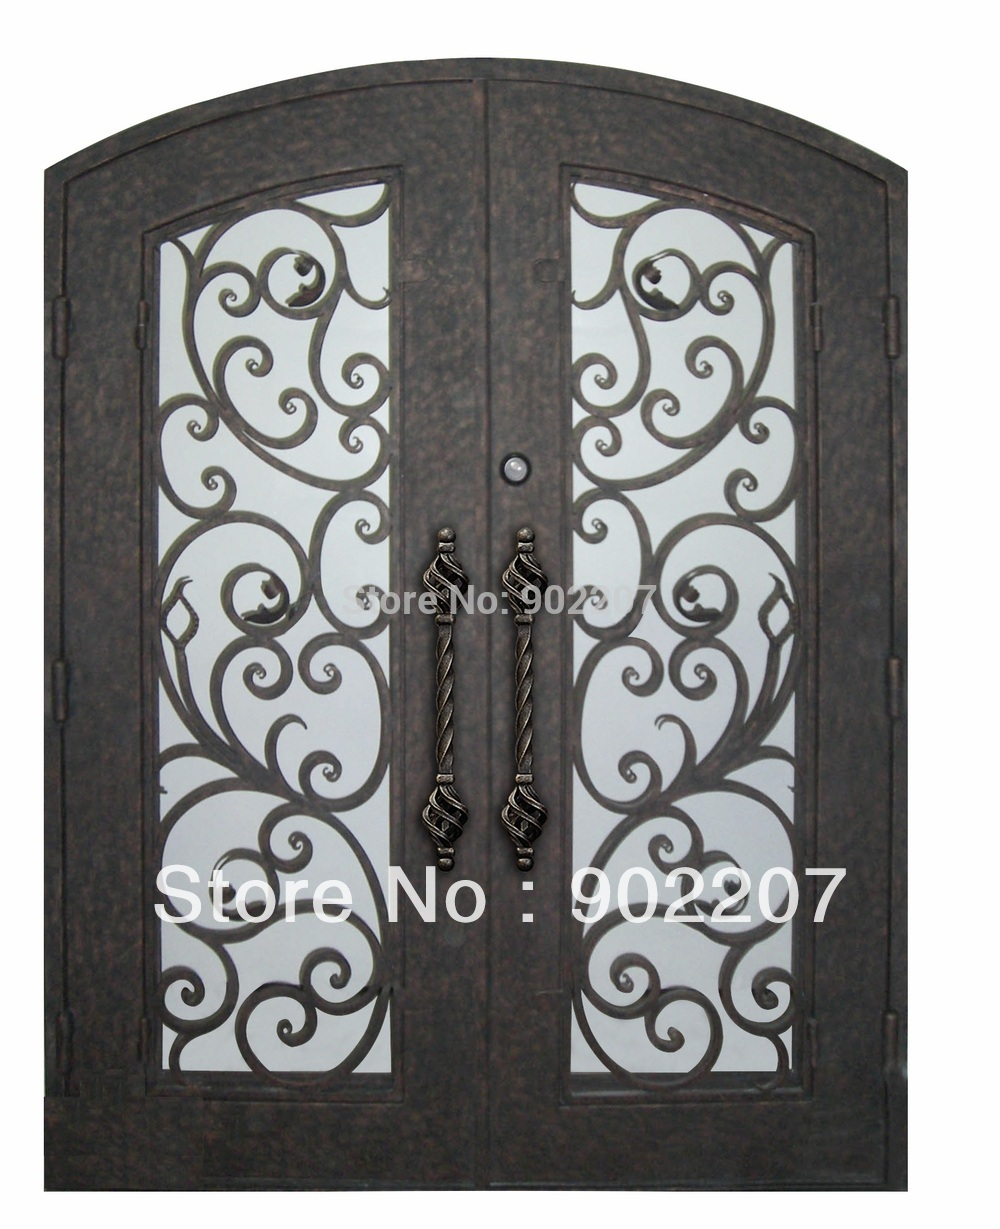 Hench 100% Steel Iron Doors  Model Hc-id140